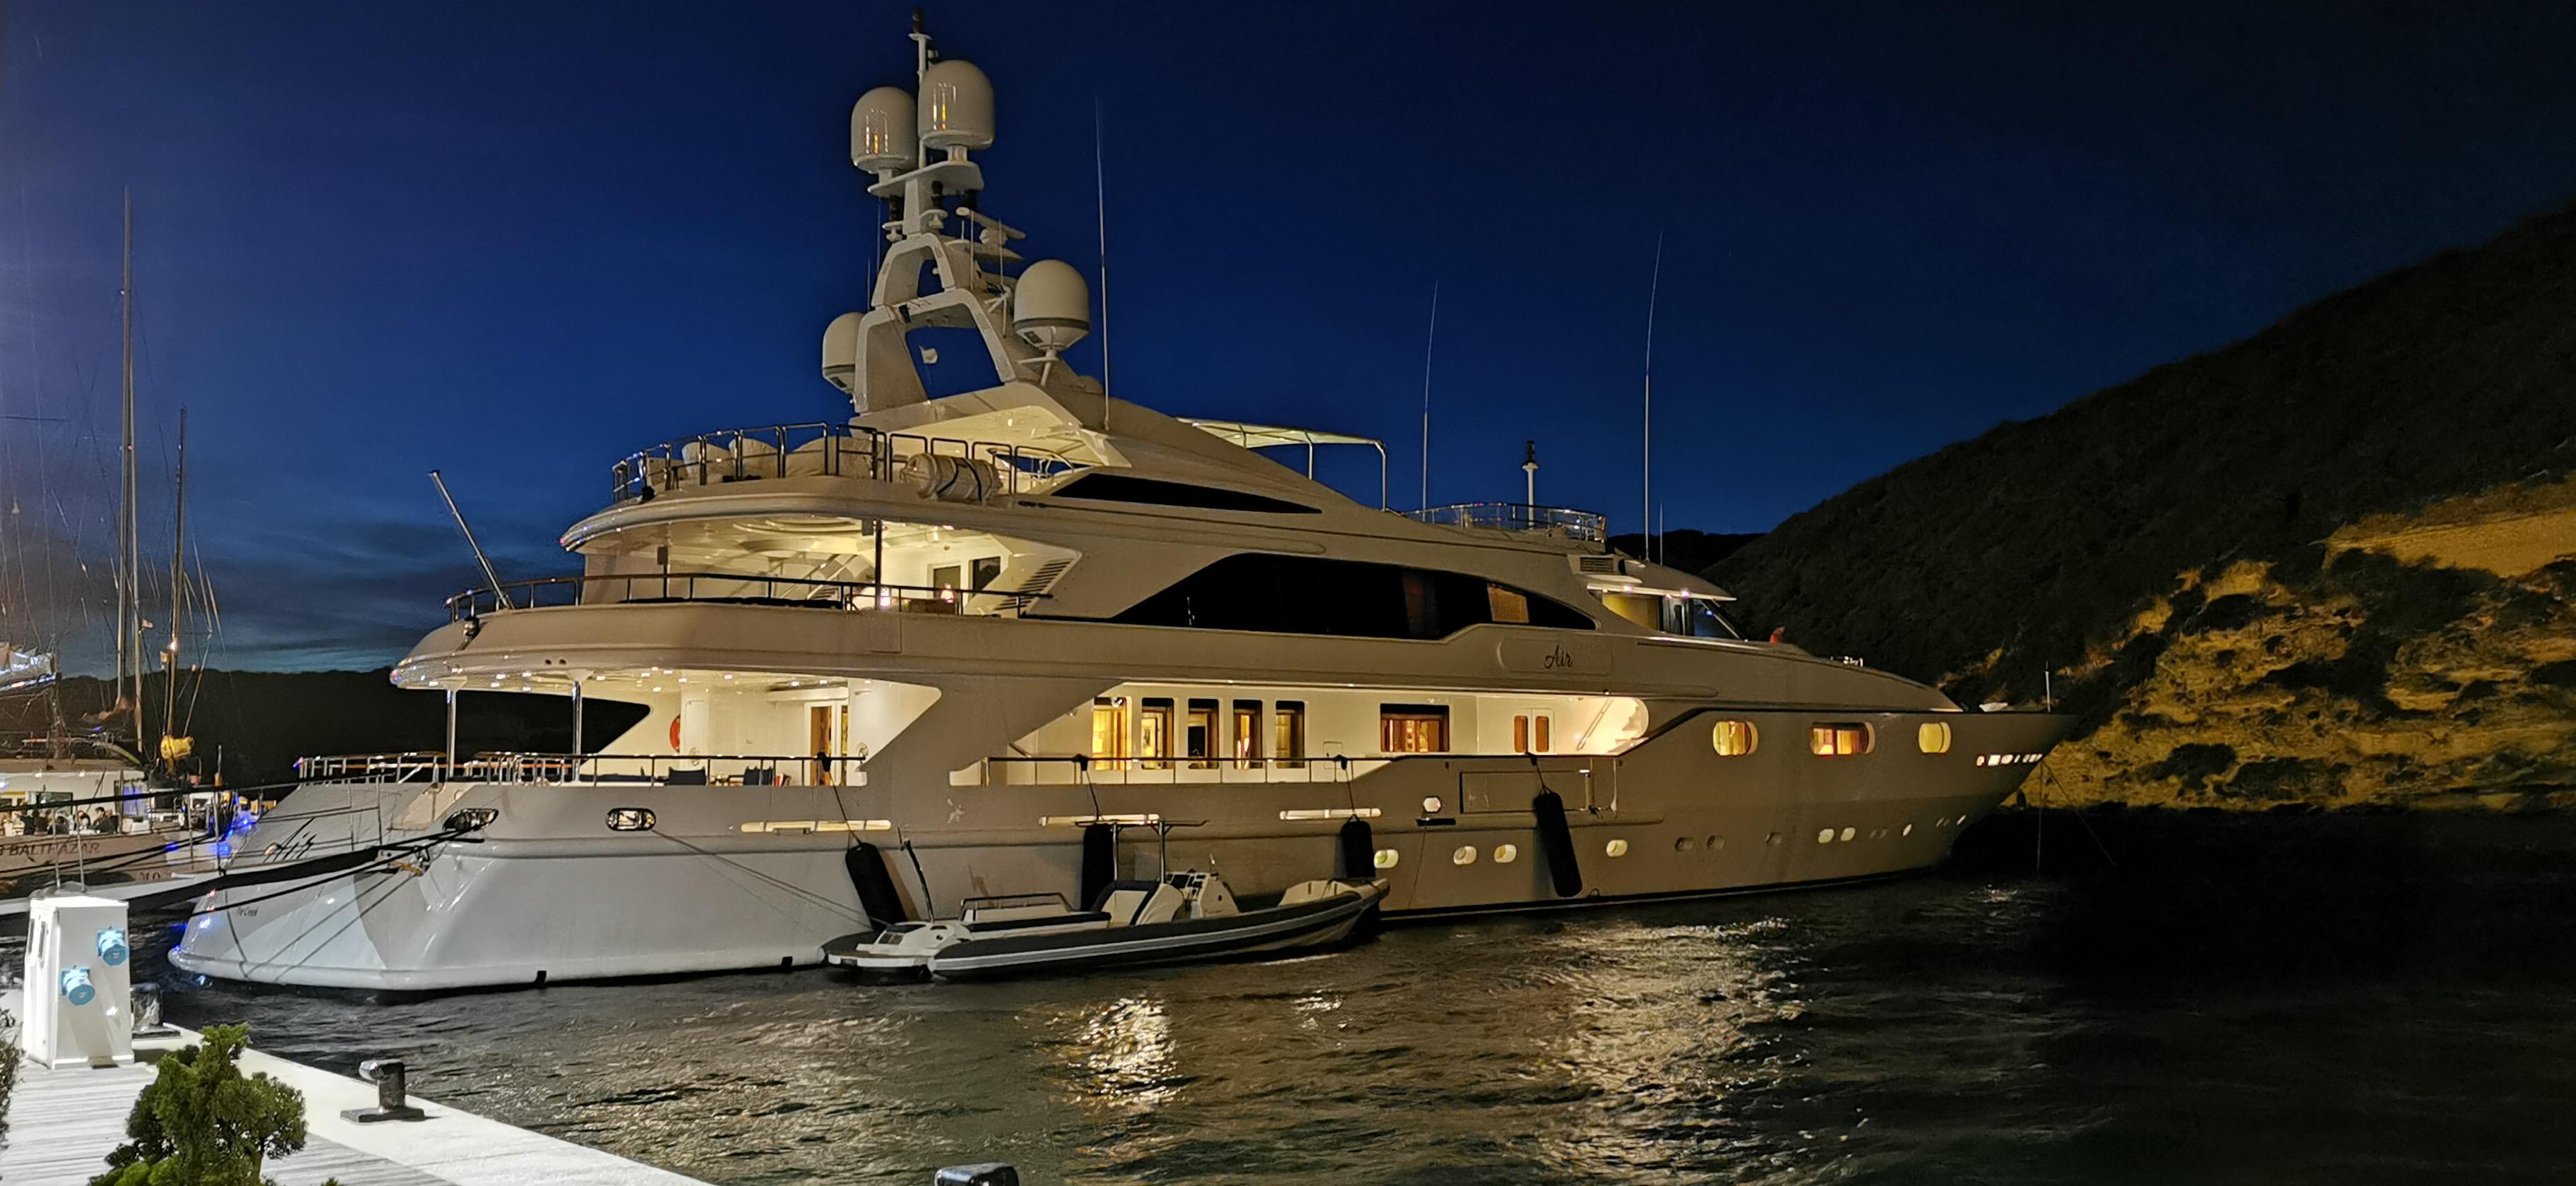 Motor Yacht AIR Off Bonifacio